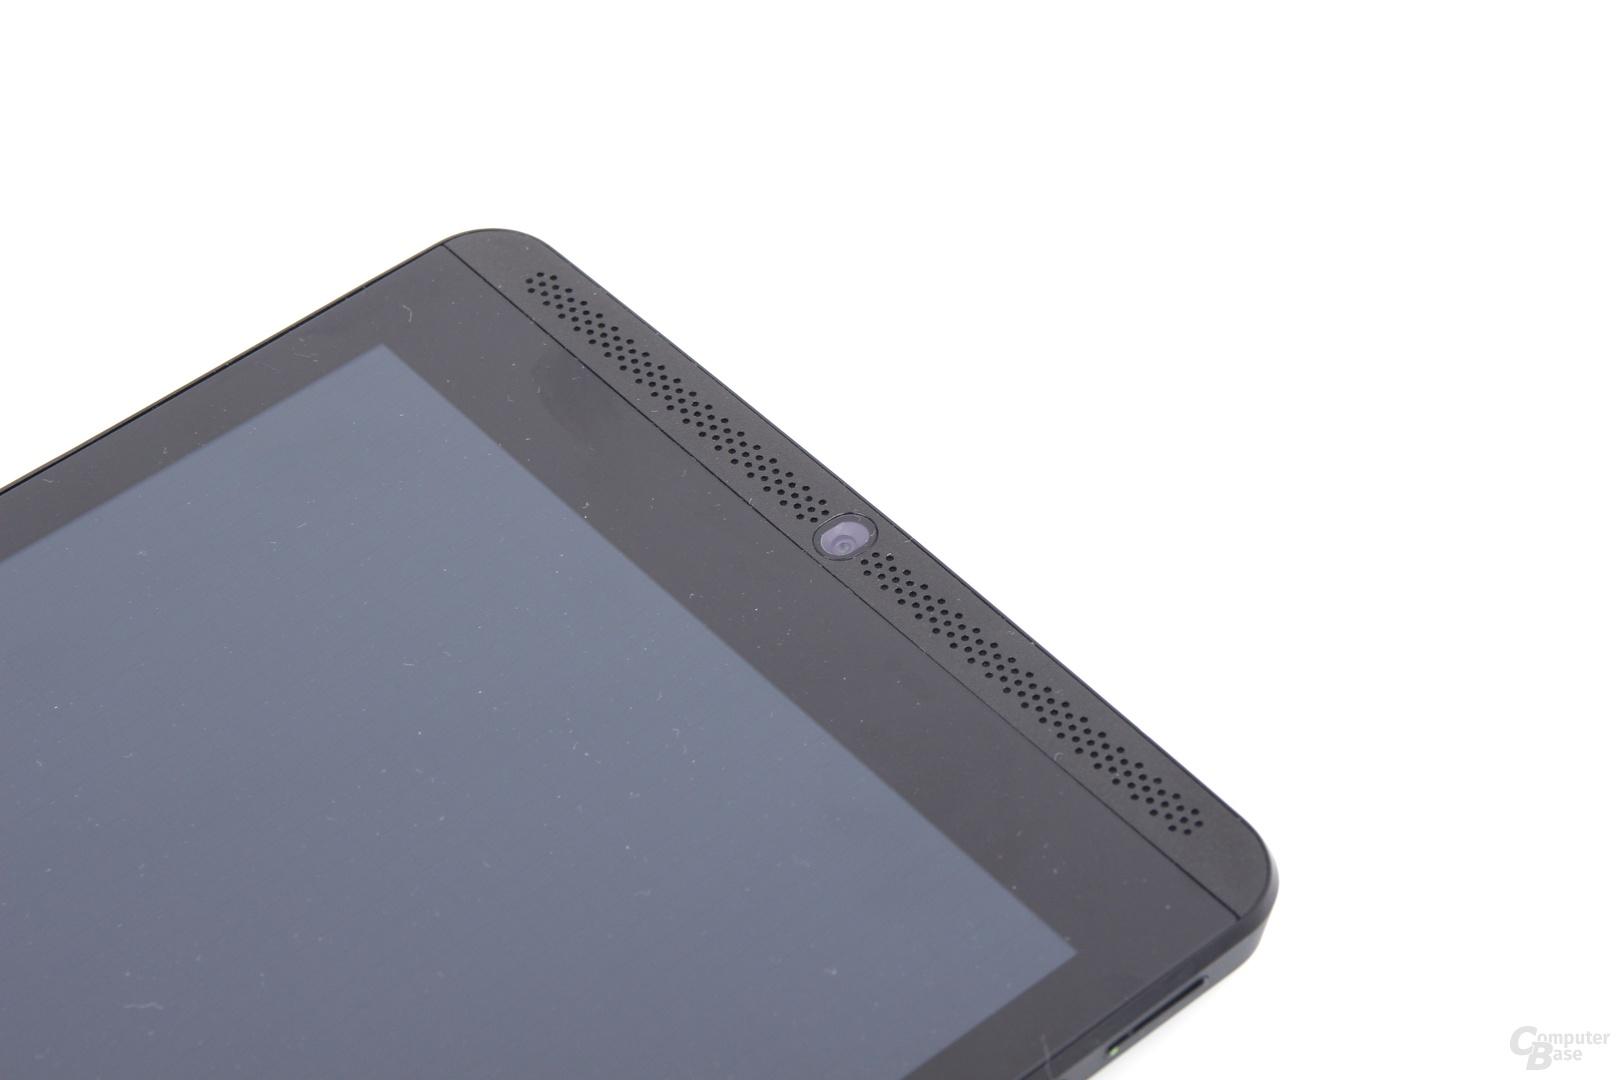 Nvidia Shield Tablet - Lautsprecher und Kamera